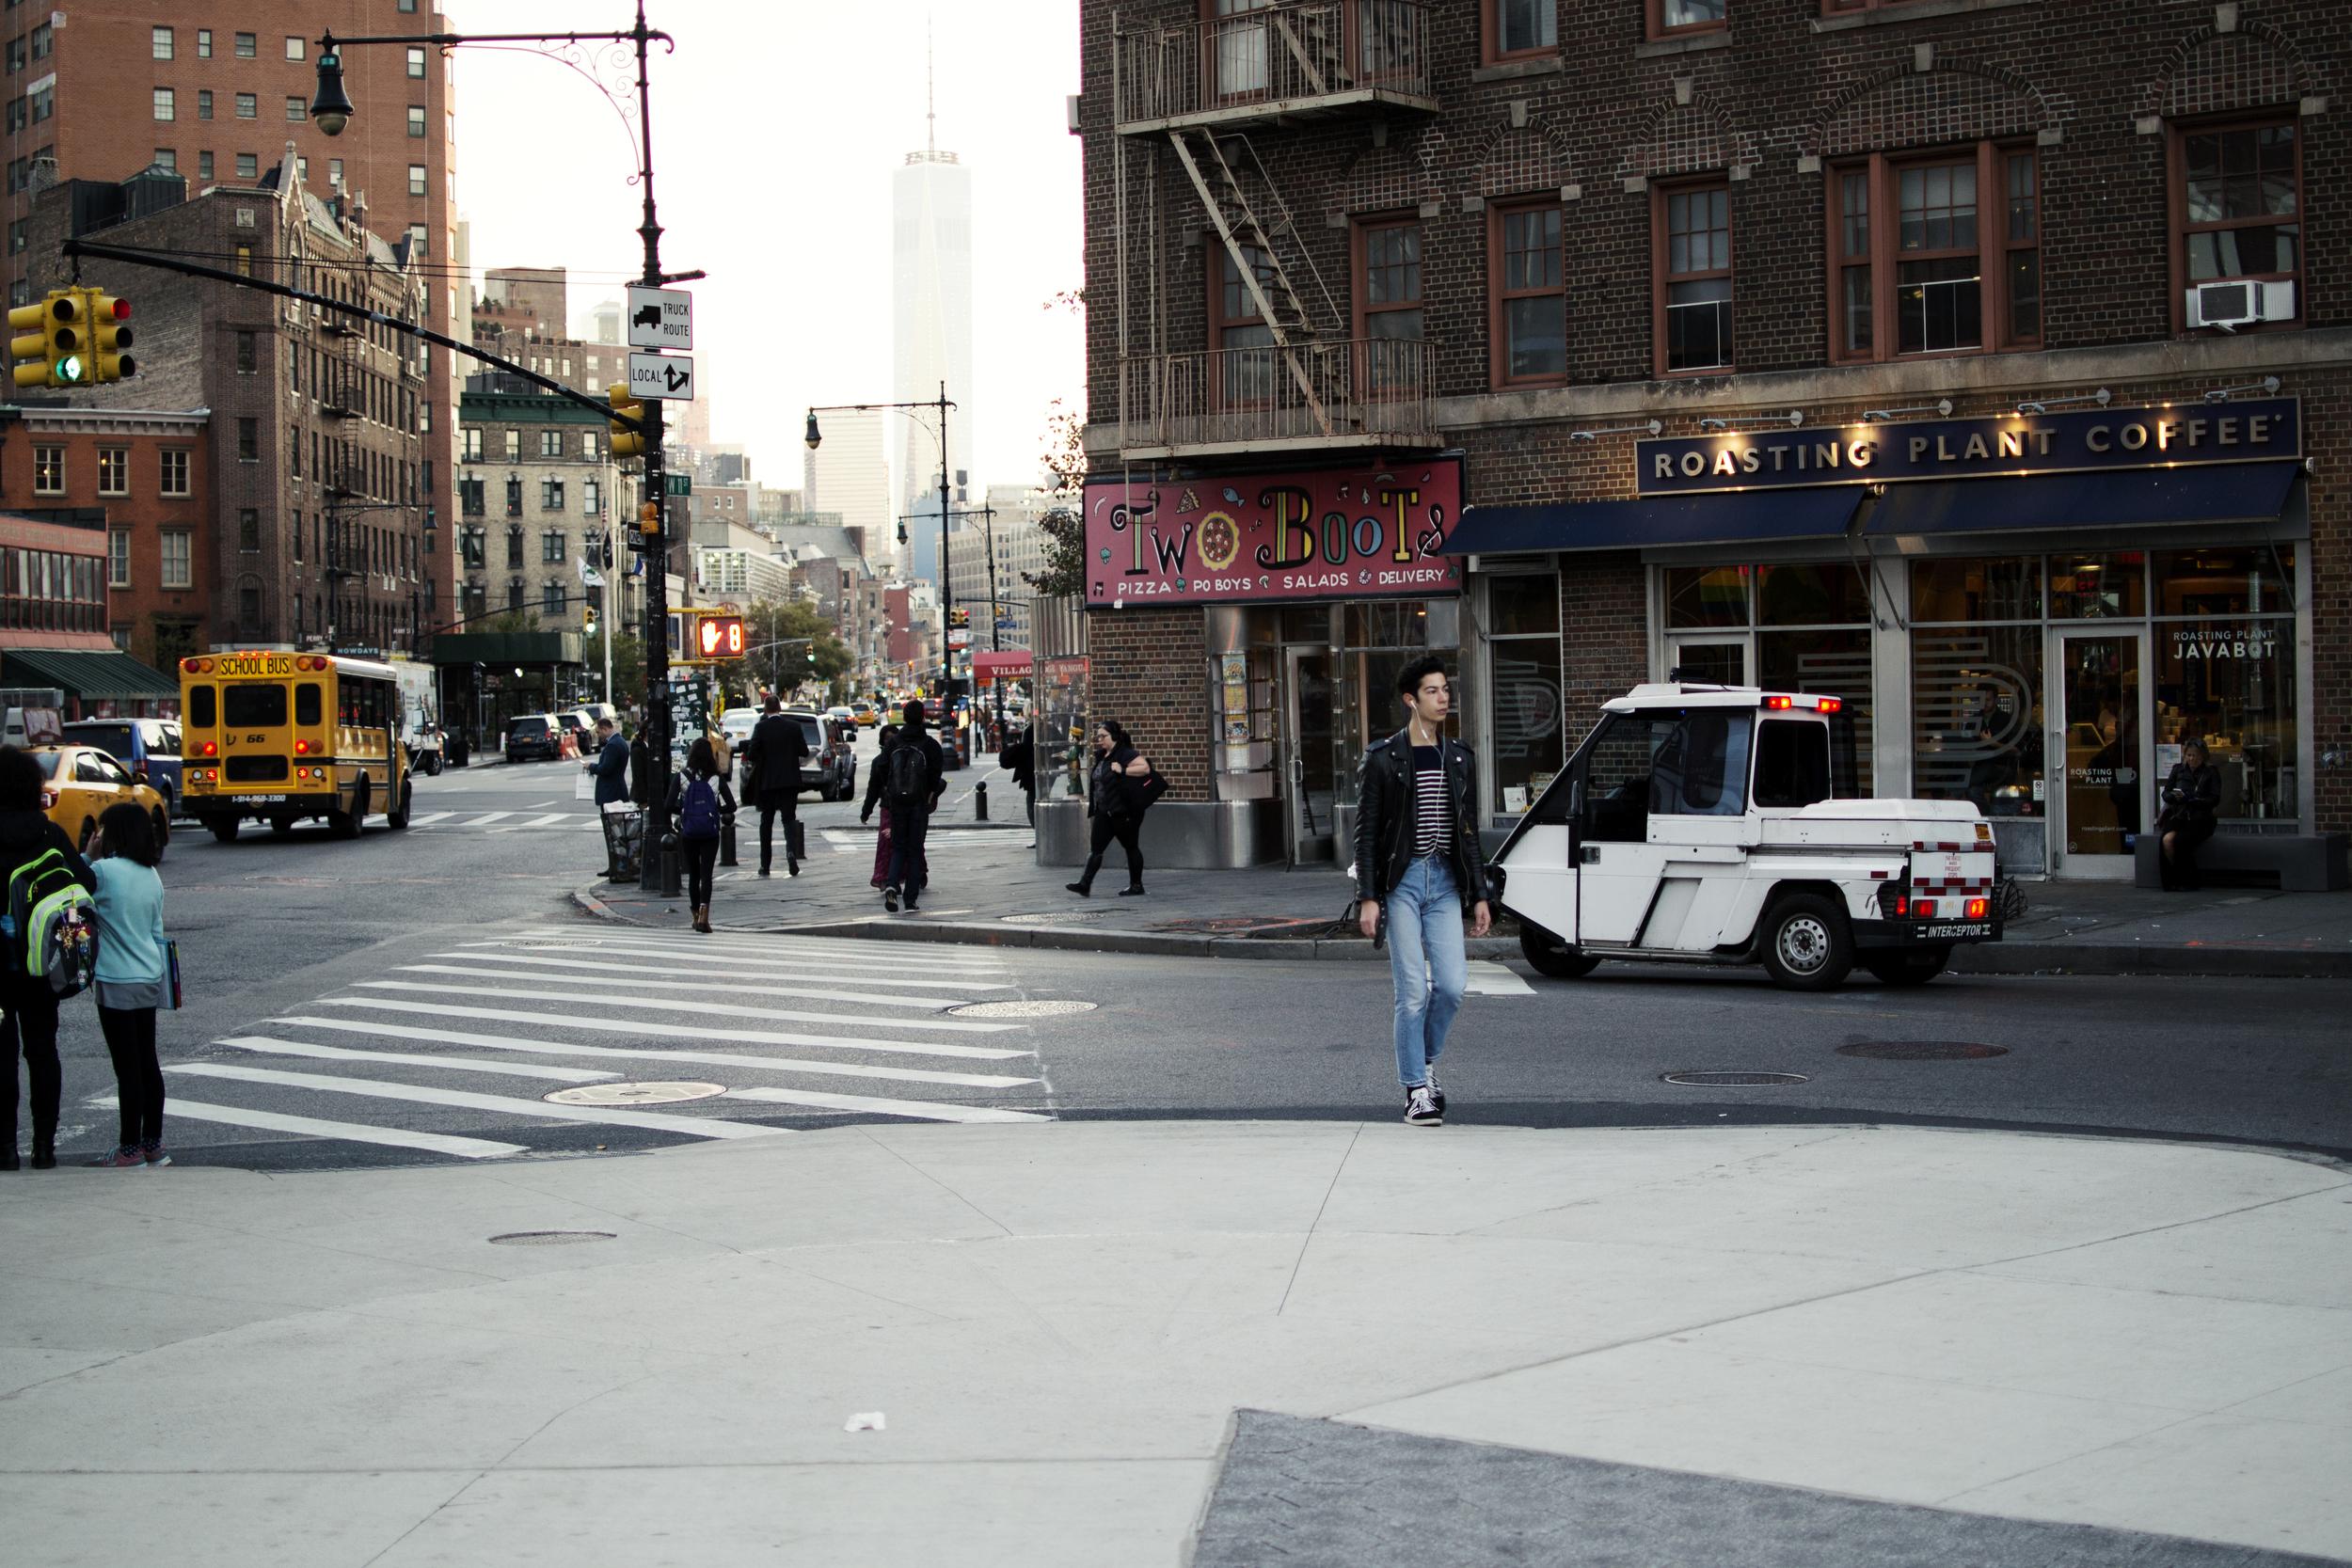 West 11th & 7th Avenue